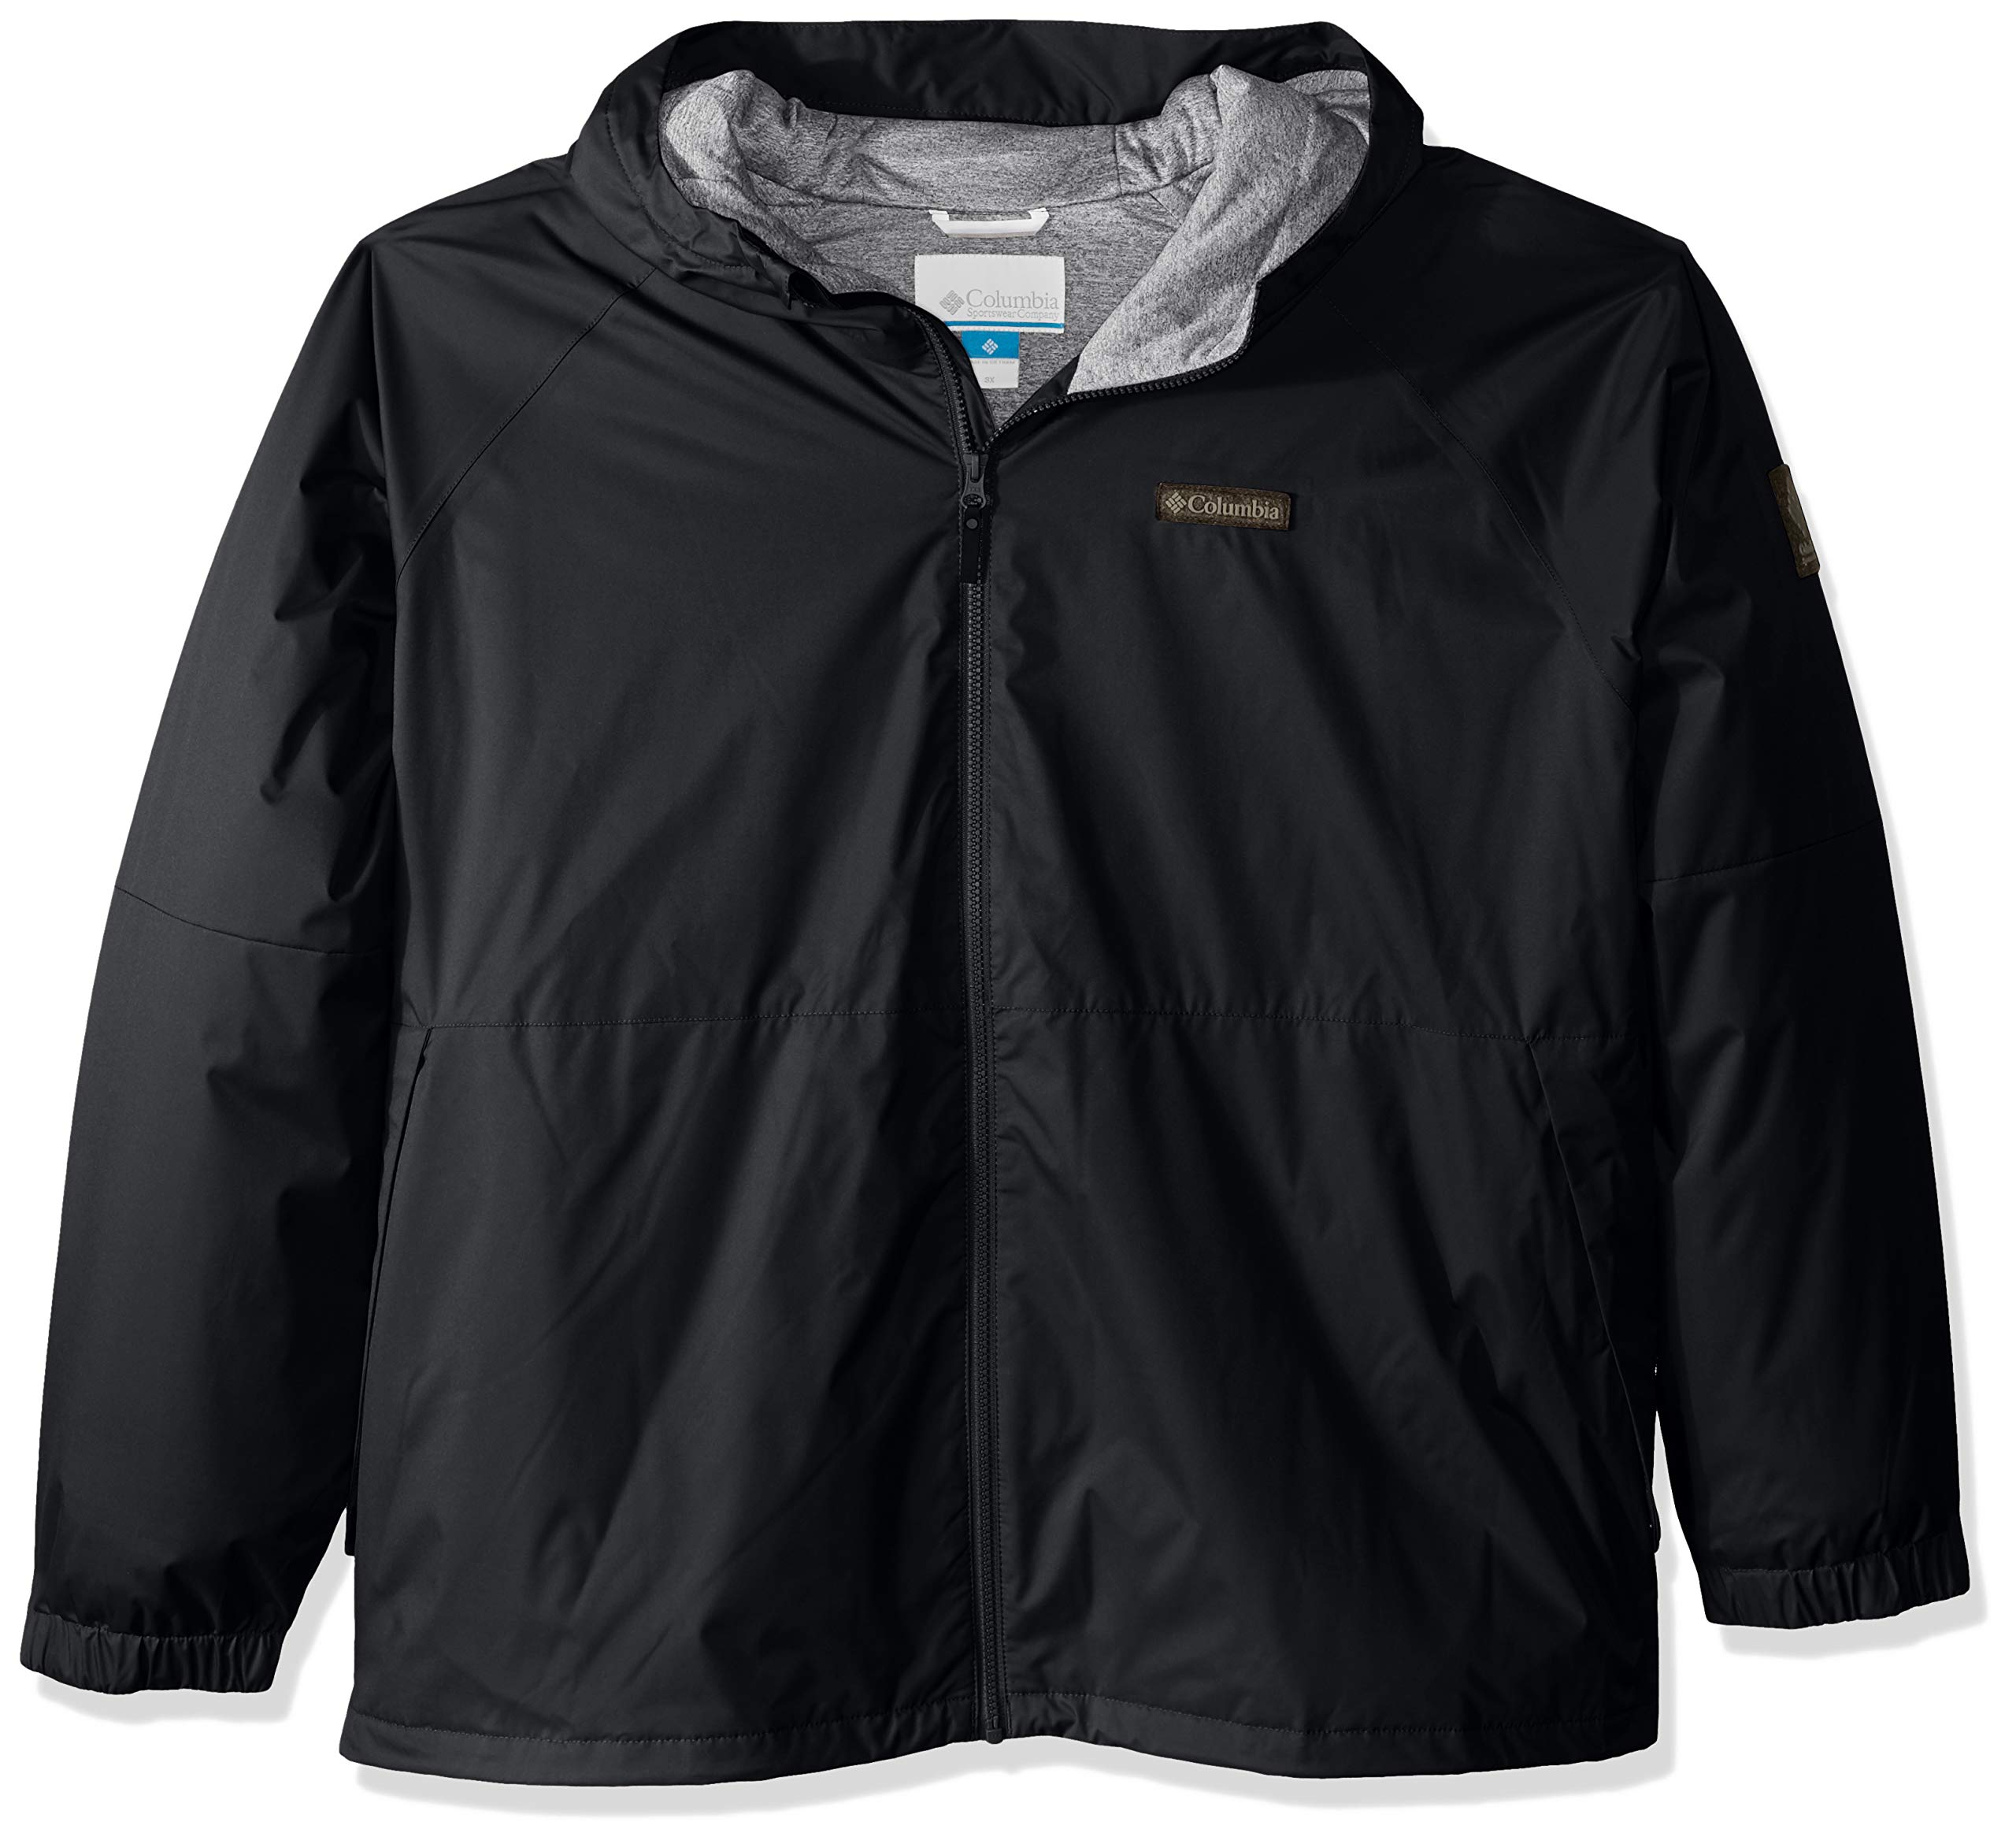 Columbia Men's Helvetia Heights Jacket, Black, 2X by Columbia